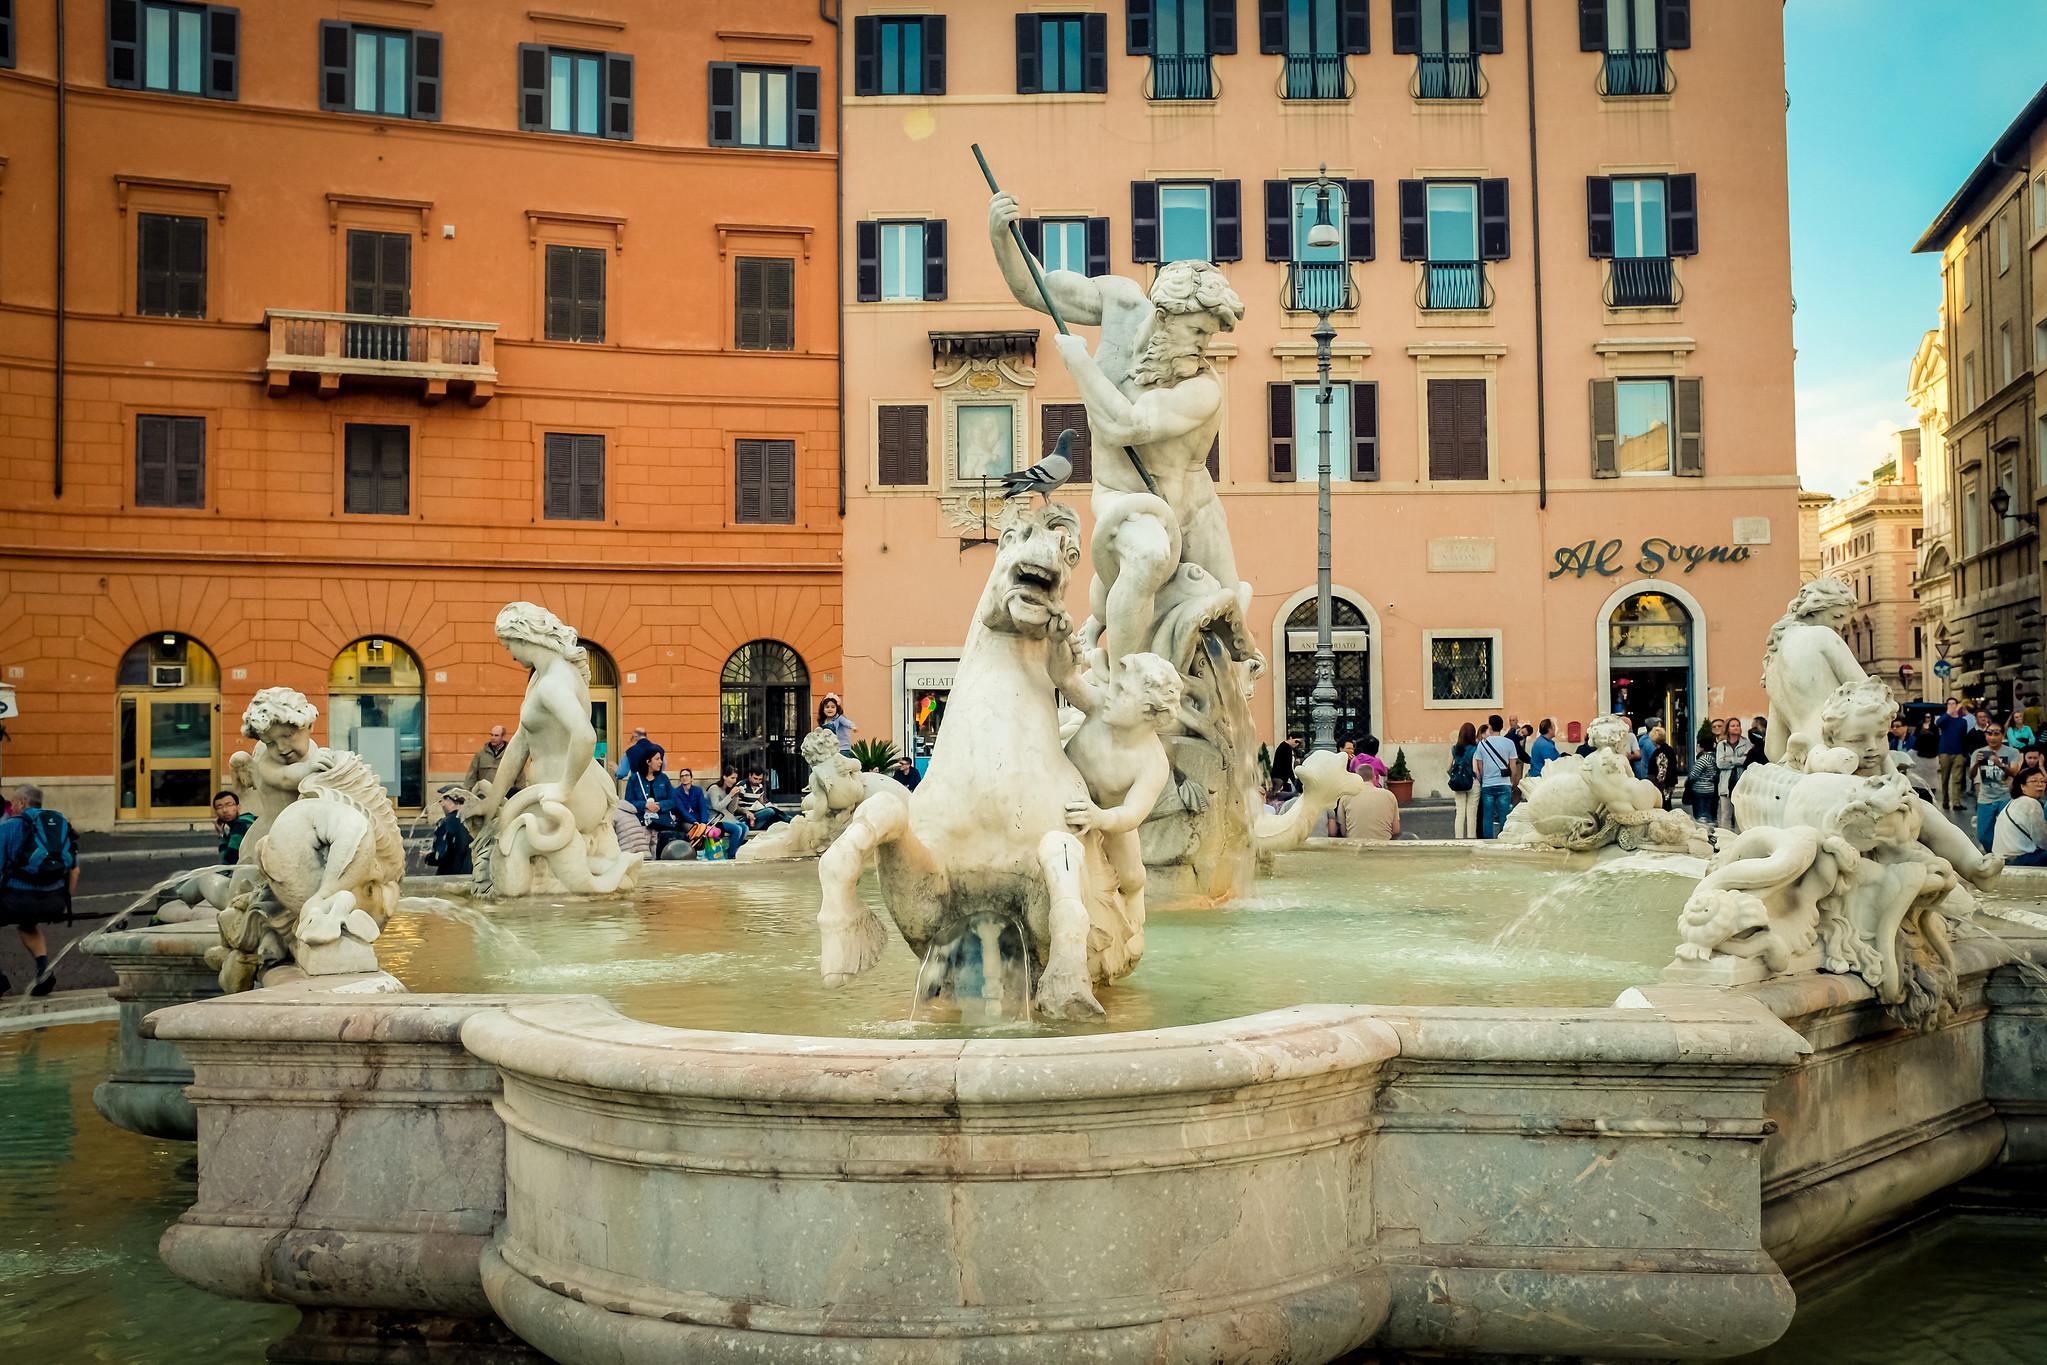 Piazza Navona, Fontana del Moro